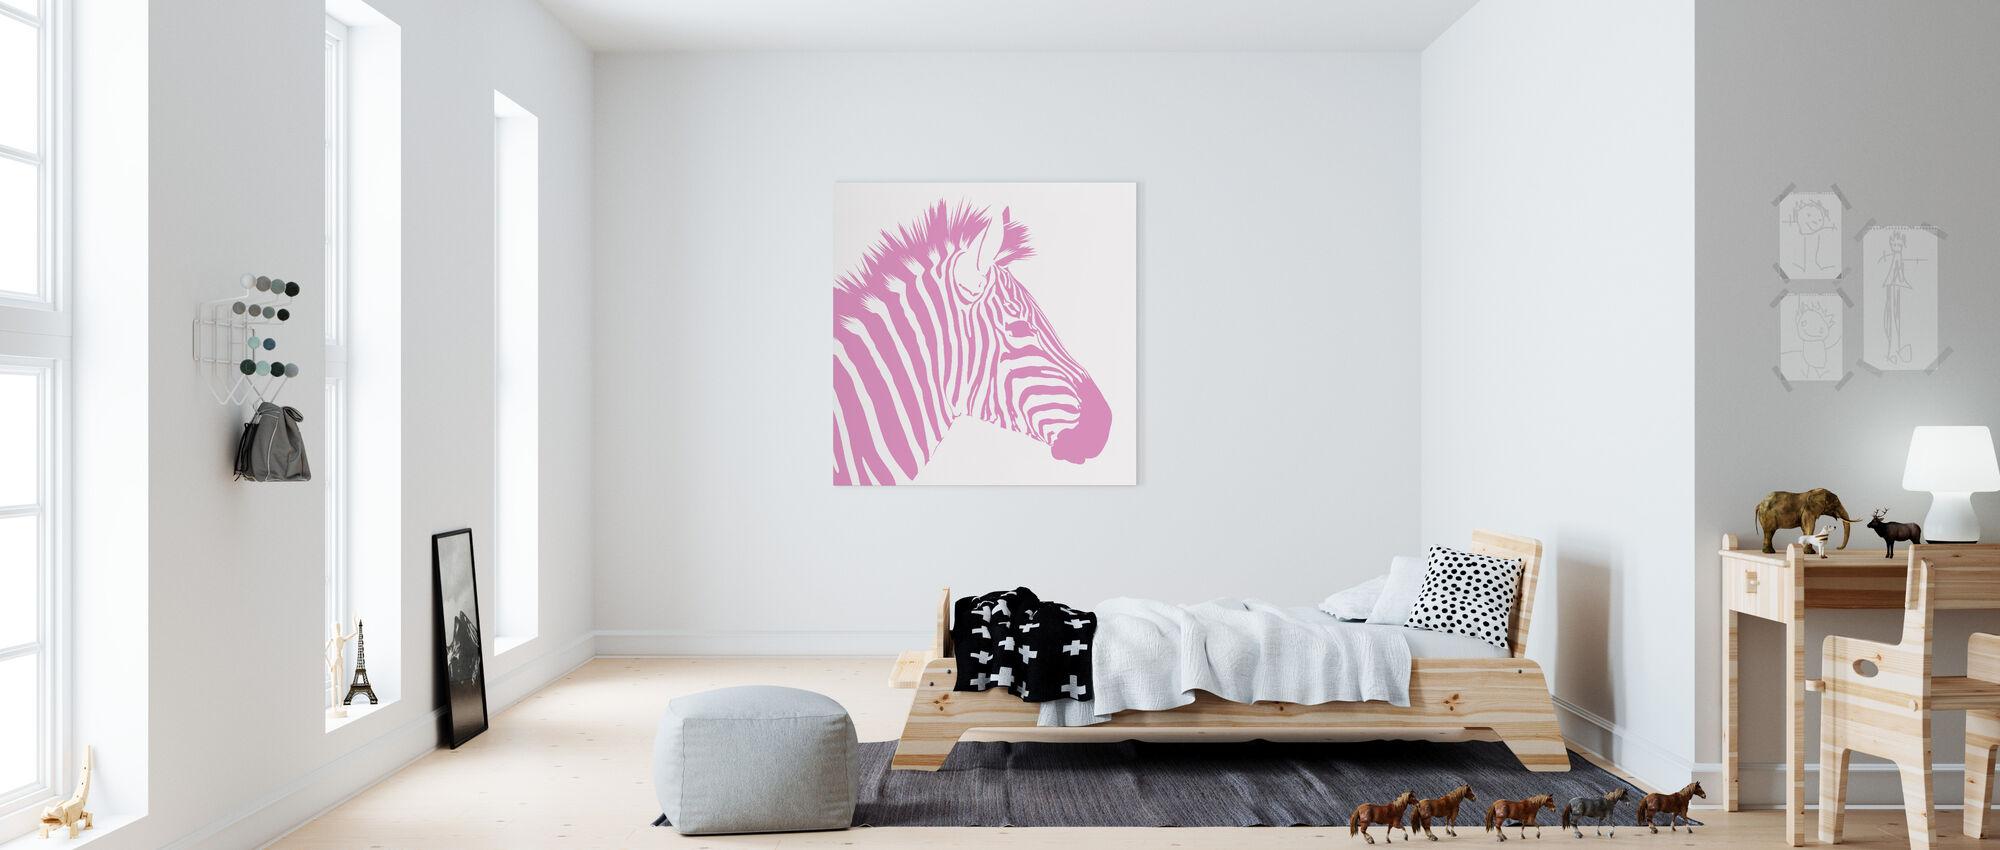 Good Looker - Canvas print - Kids Room